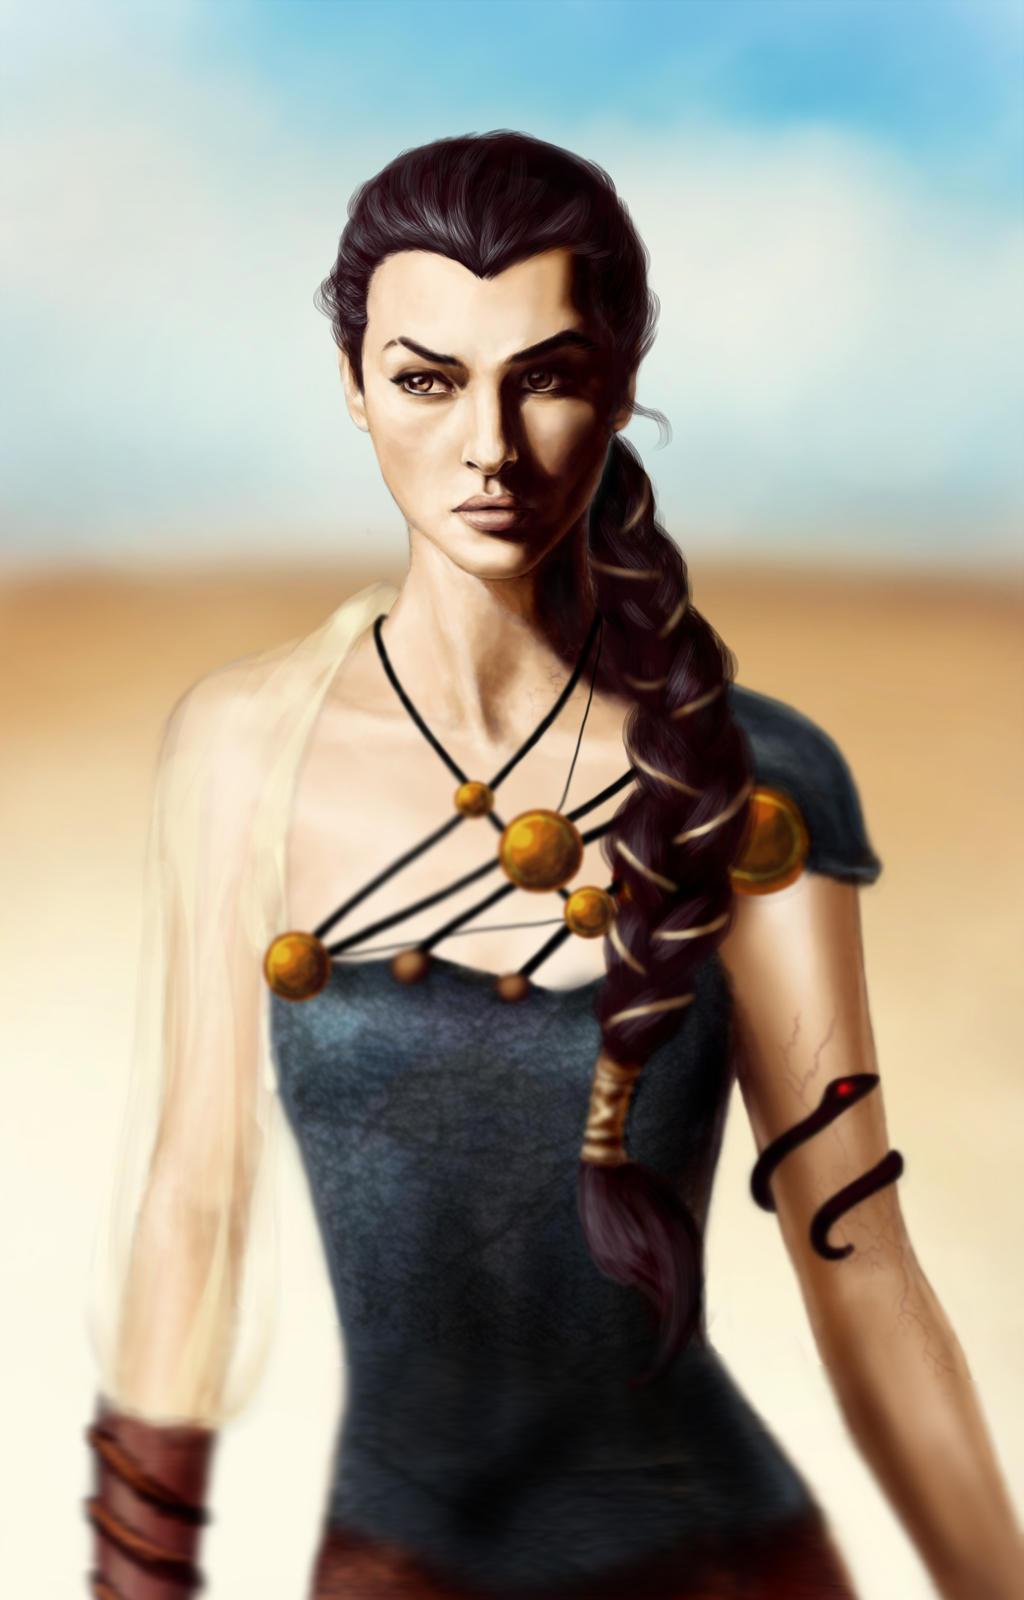 Nymeria Sand by hardcoremiike